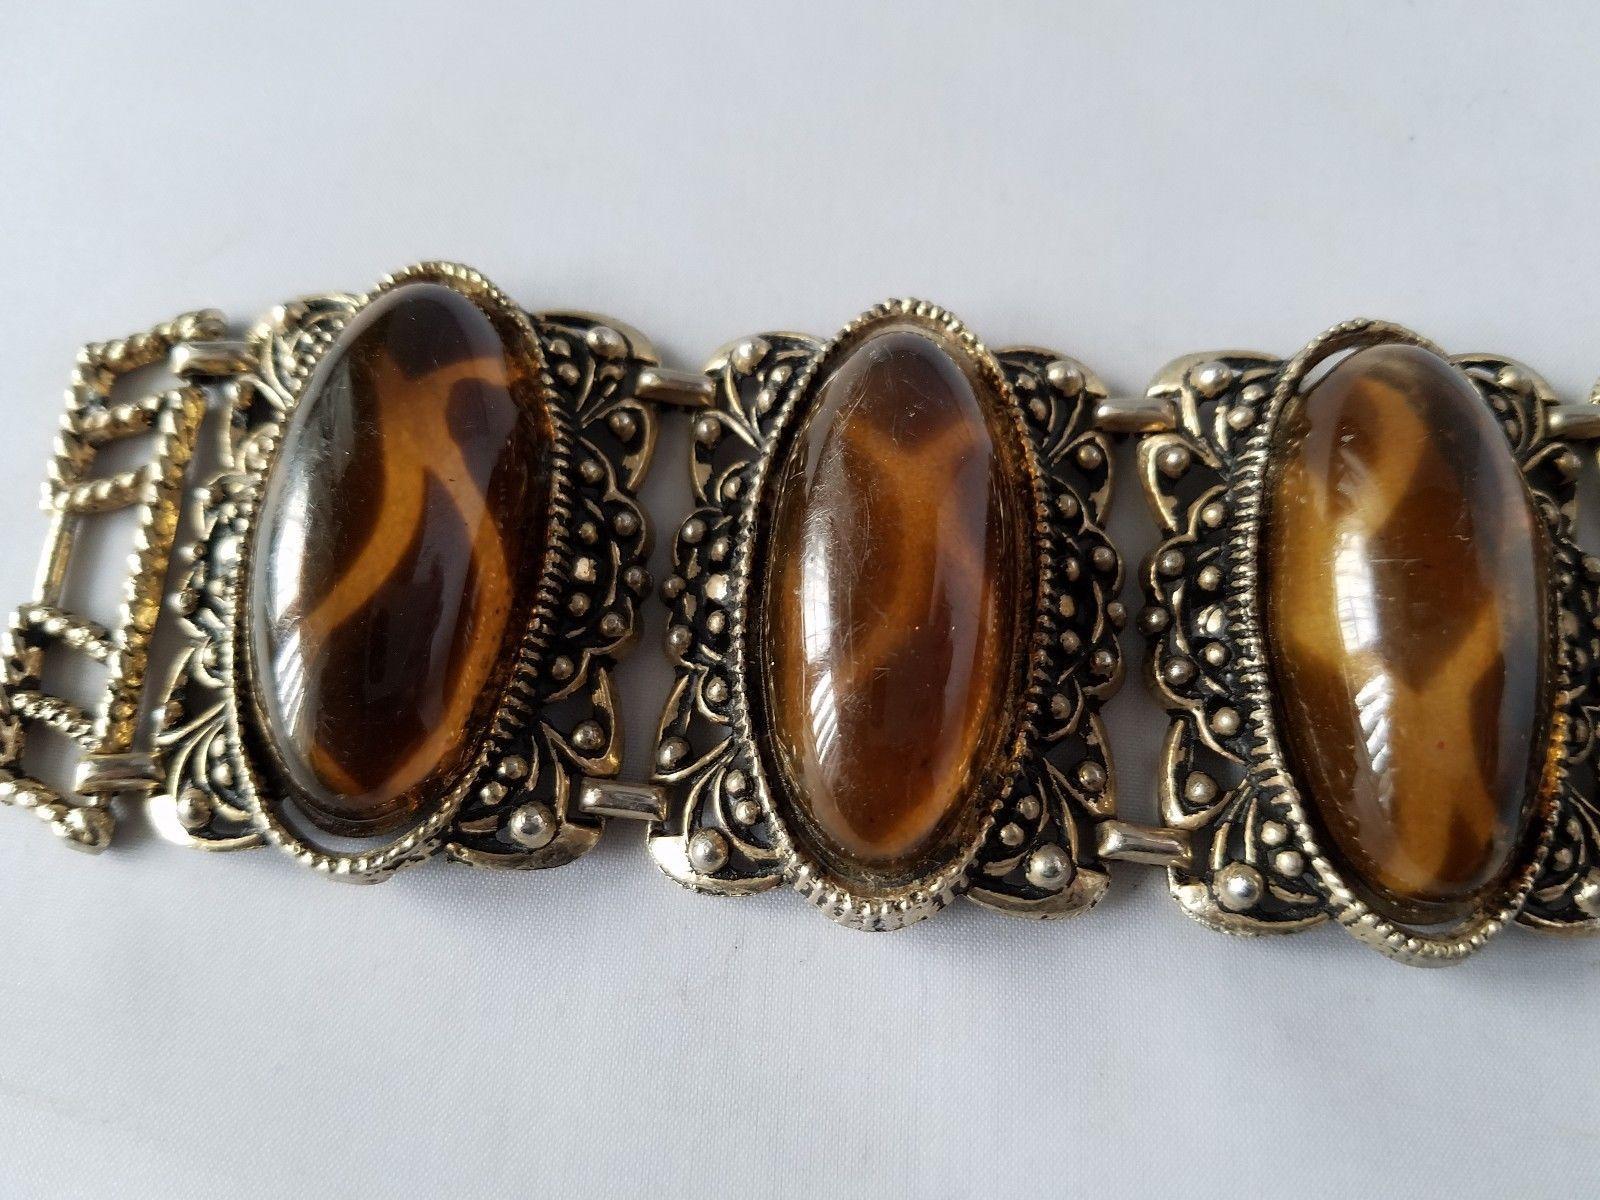 Vintage Fashion Jewelry Set Gold Tone Amber Tortoise Shell Bracelet With Clasp